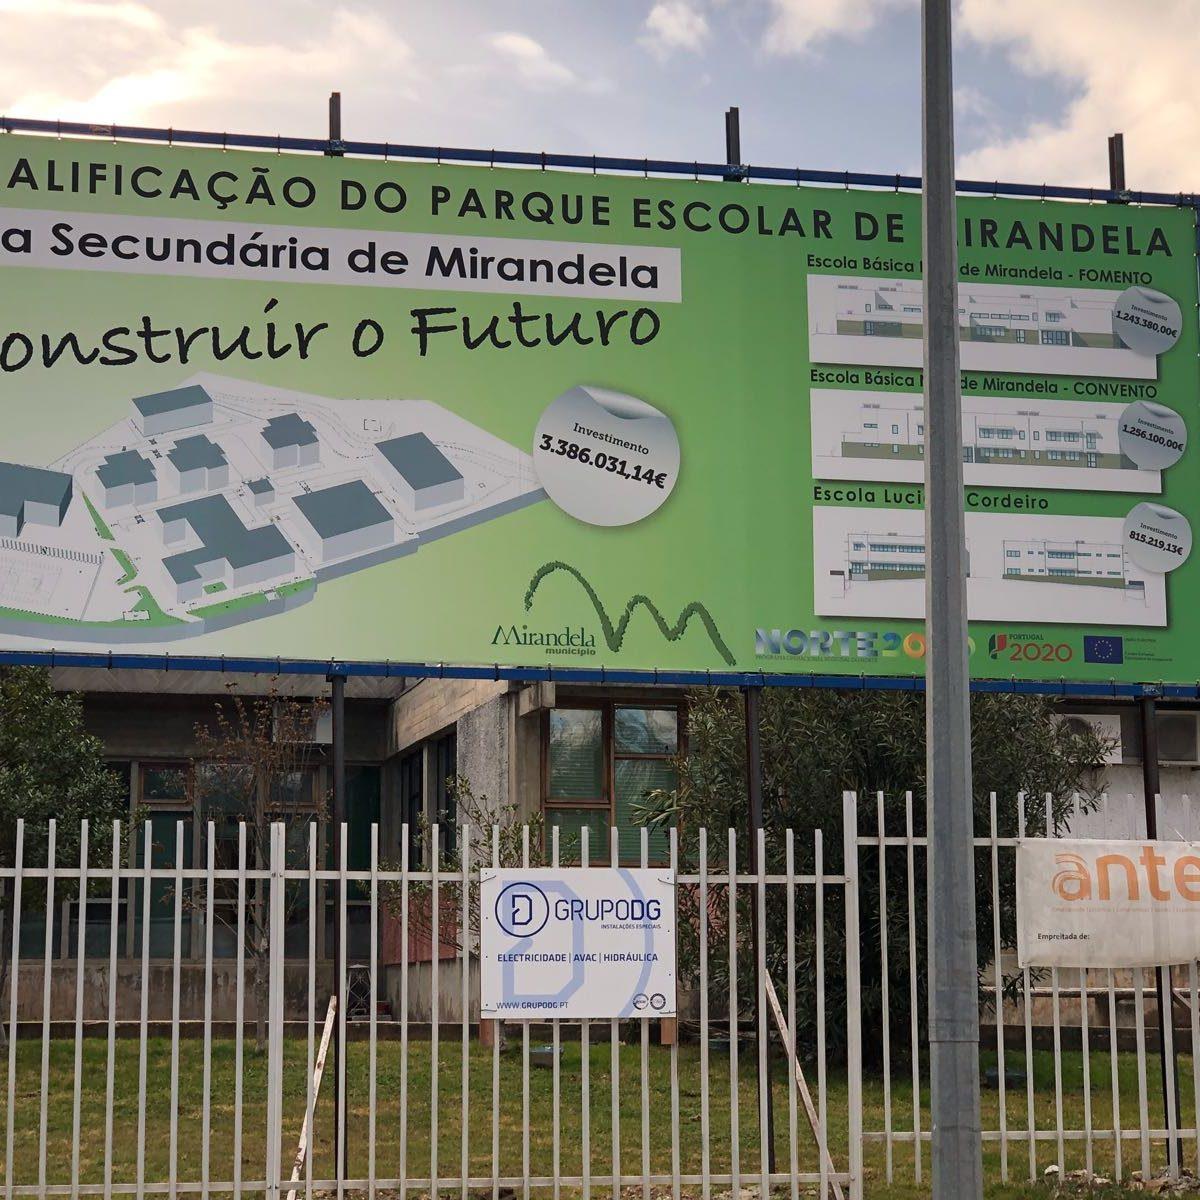 Secondary School of Mirandela